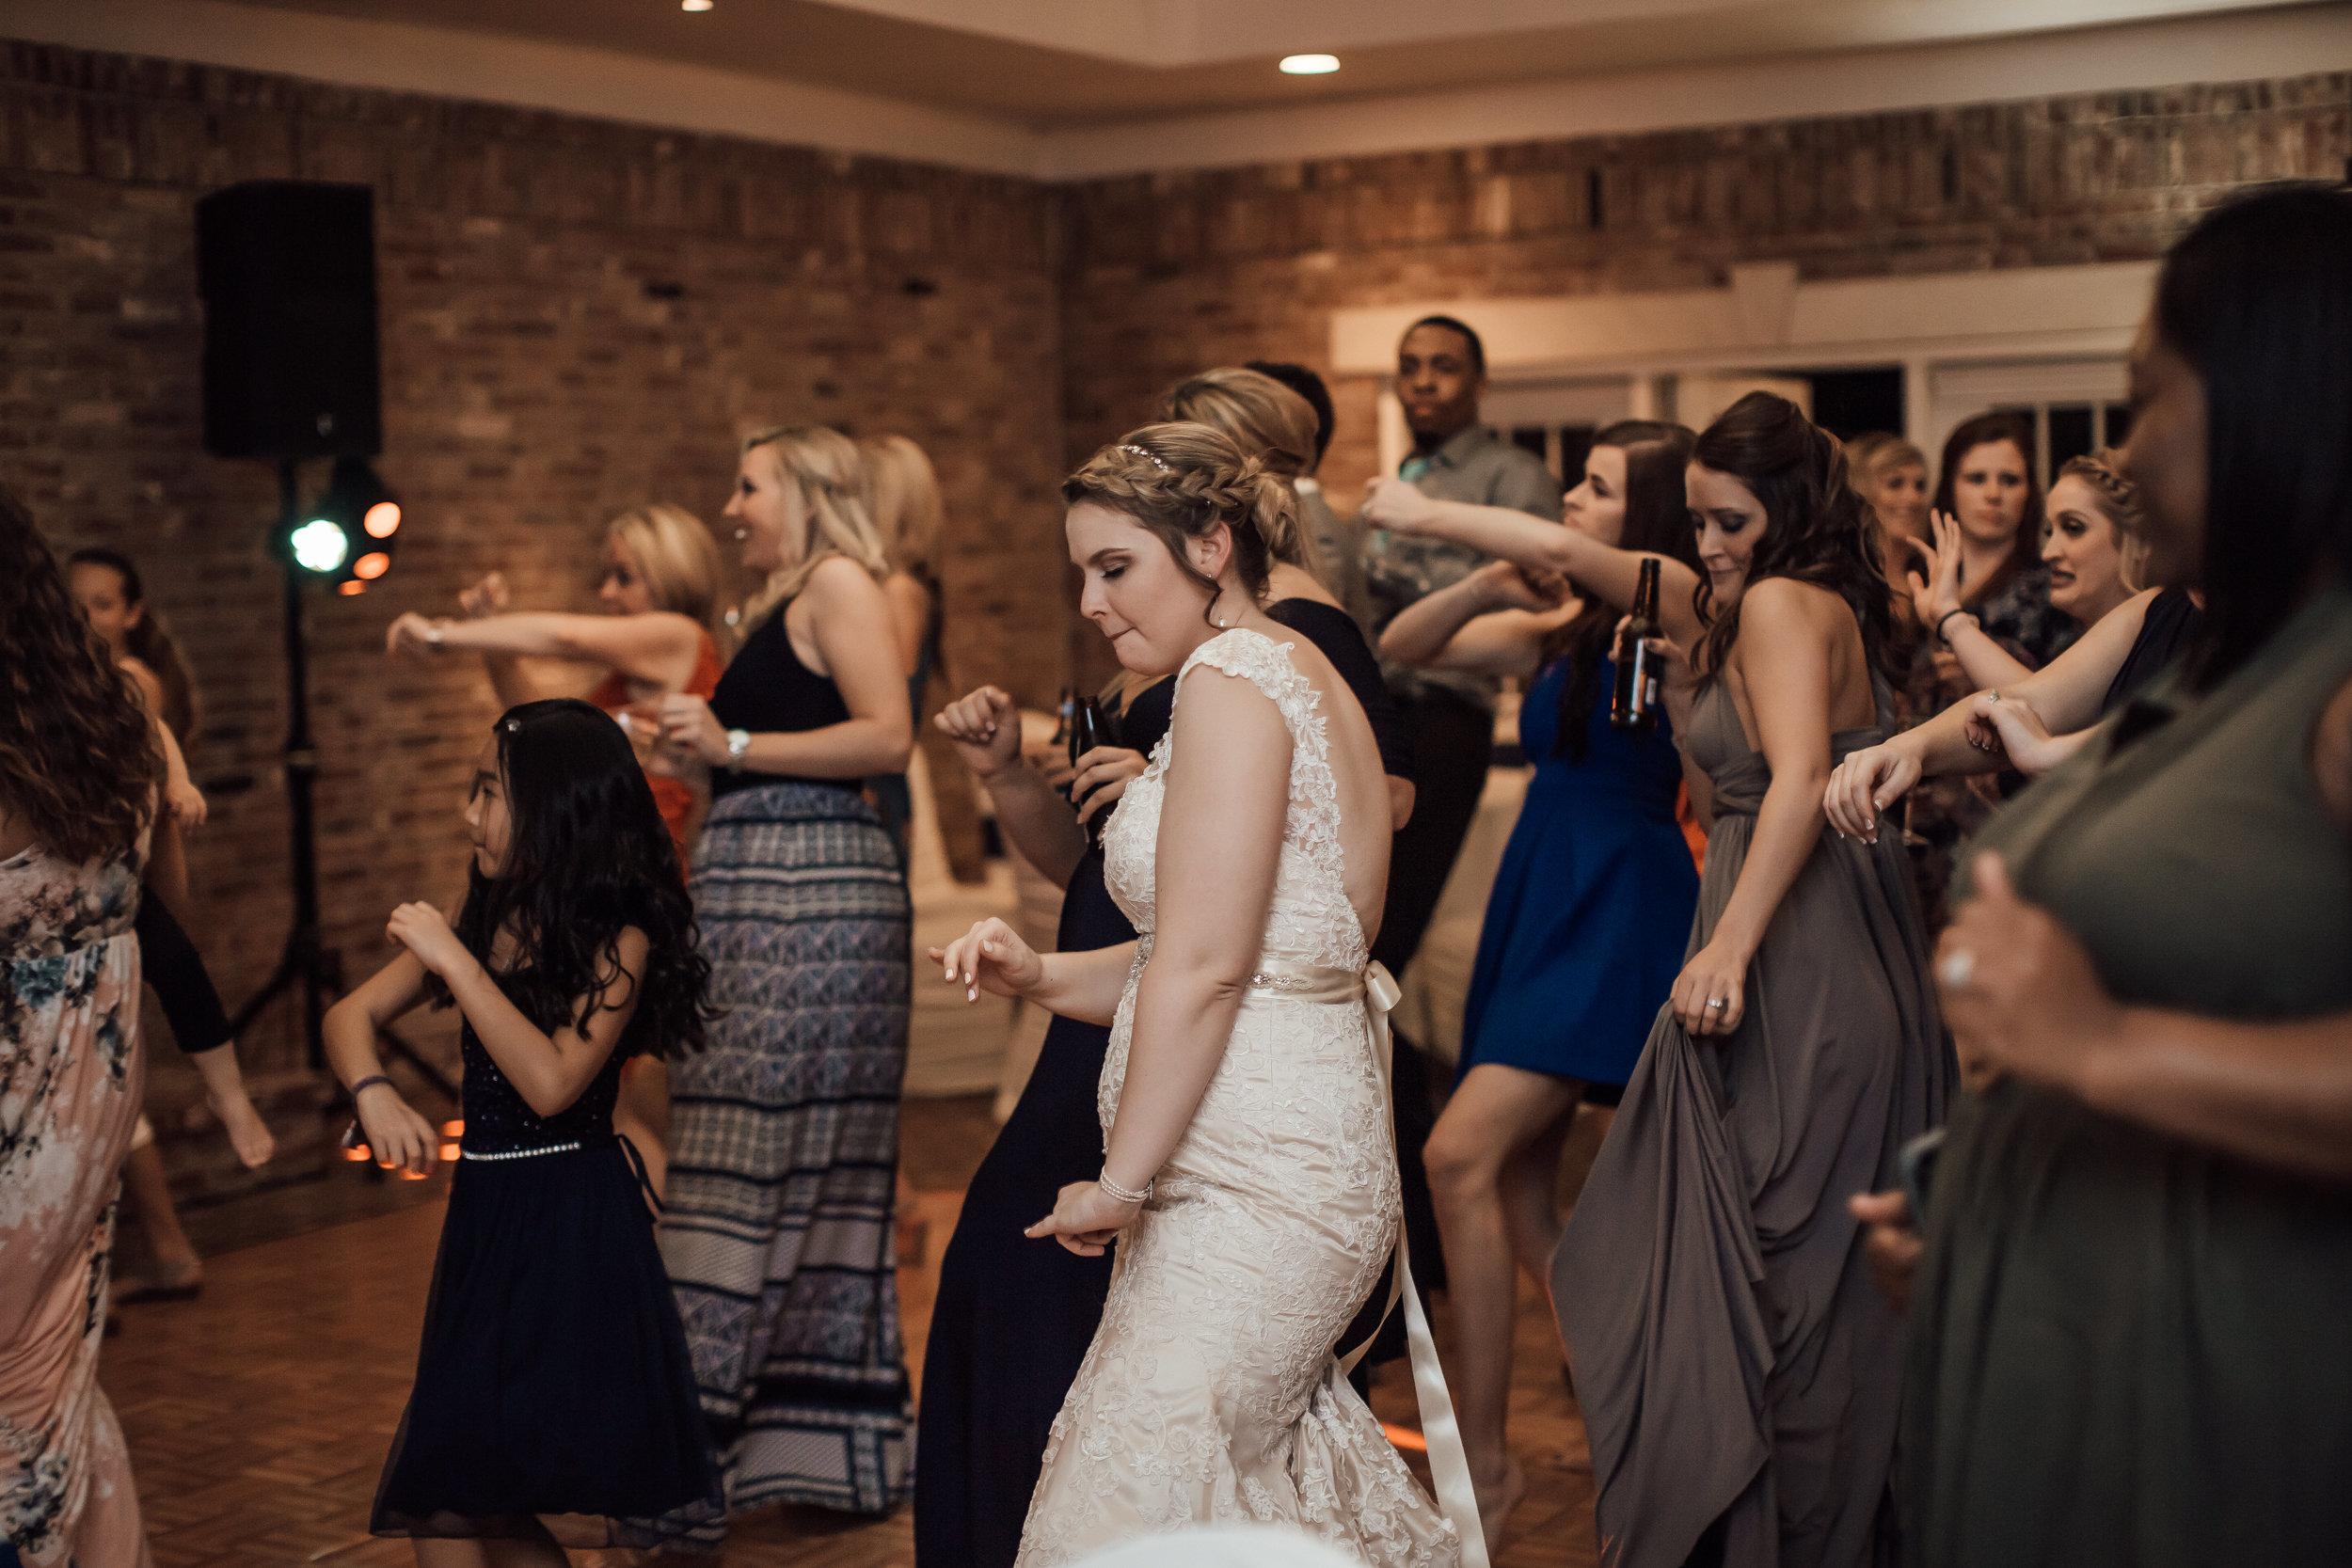 cassie-cook-photography-bonne-terre-wedding-murrell-wedding-414.jpg